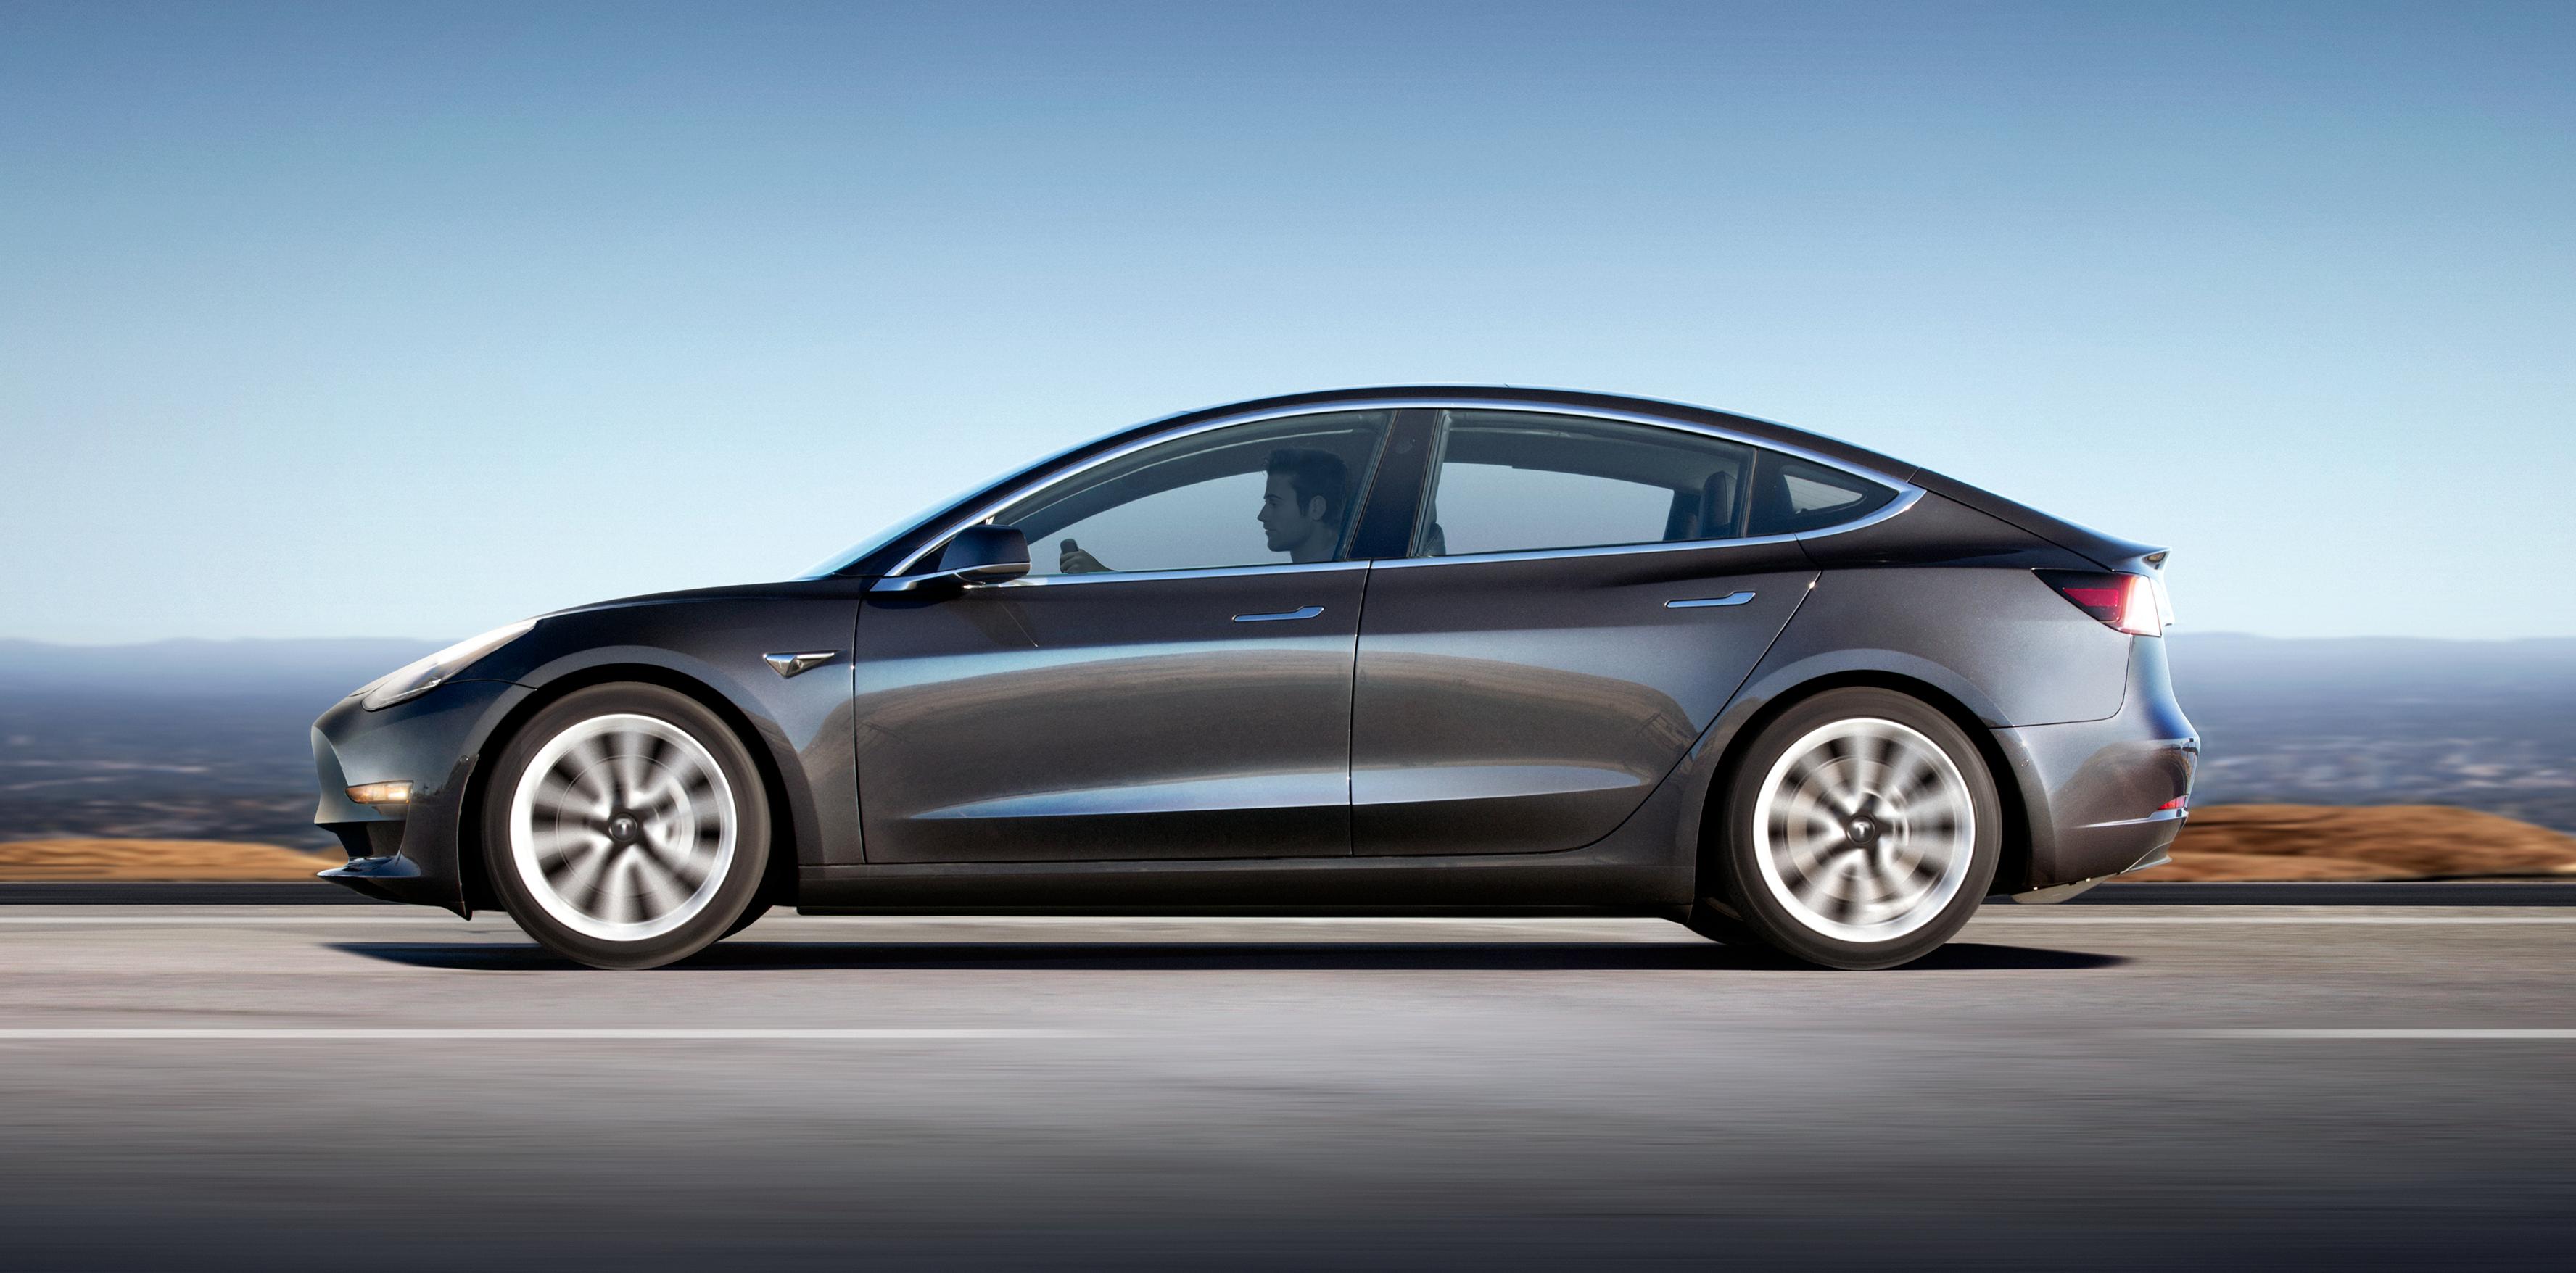 Tesla model 3 battery size